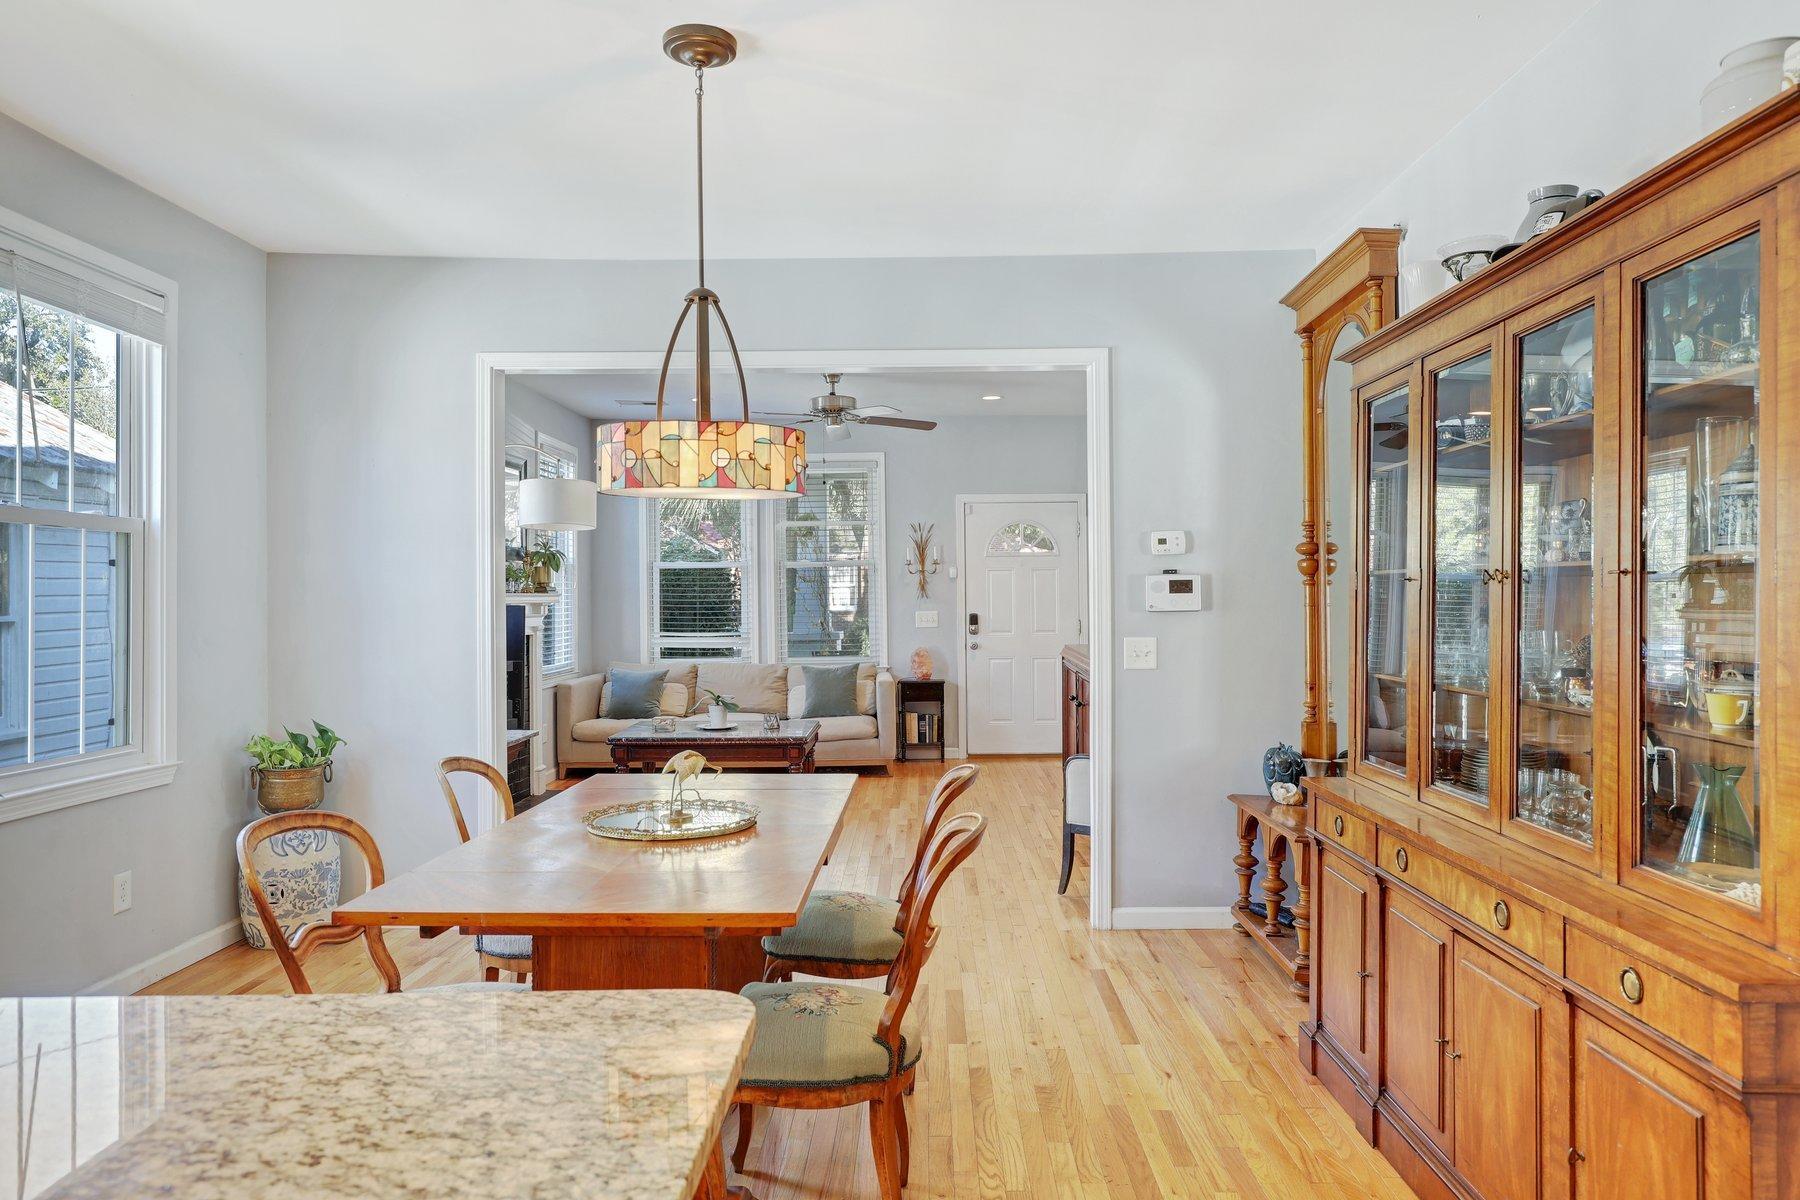 Rutledge Green Homes For Sale - 791 Rutledge, Charleston, SC - 4